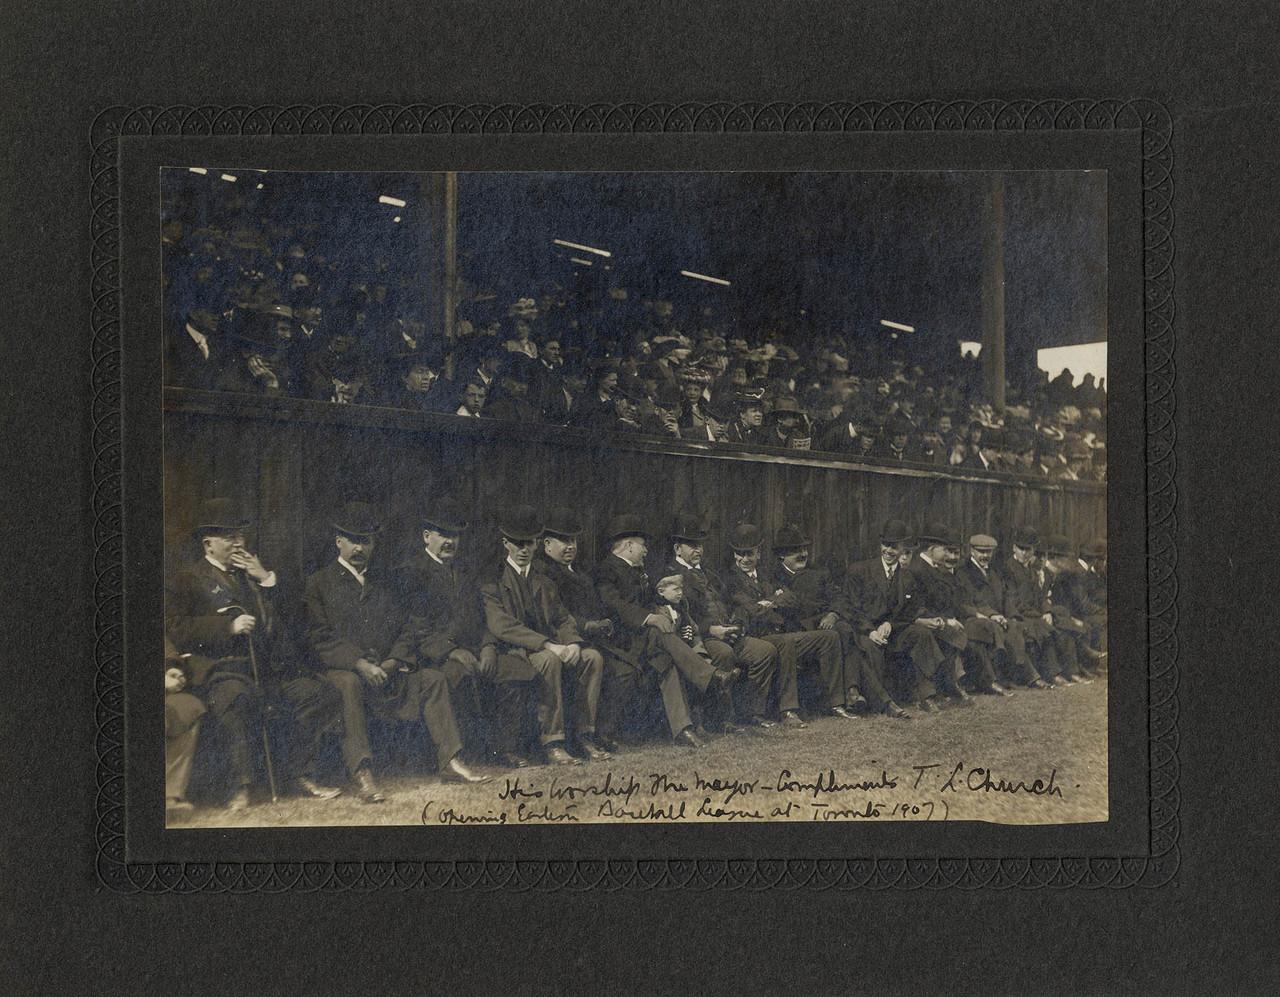 Eastern Baseball League, opening game of season at Diamond Park, Liberty St., s.e. cor. Fraser Ave.